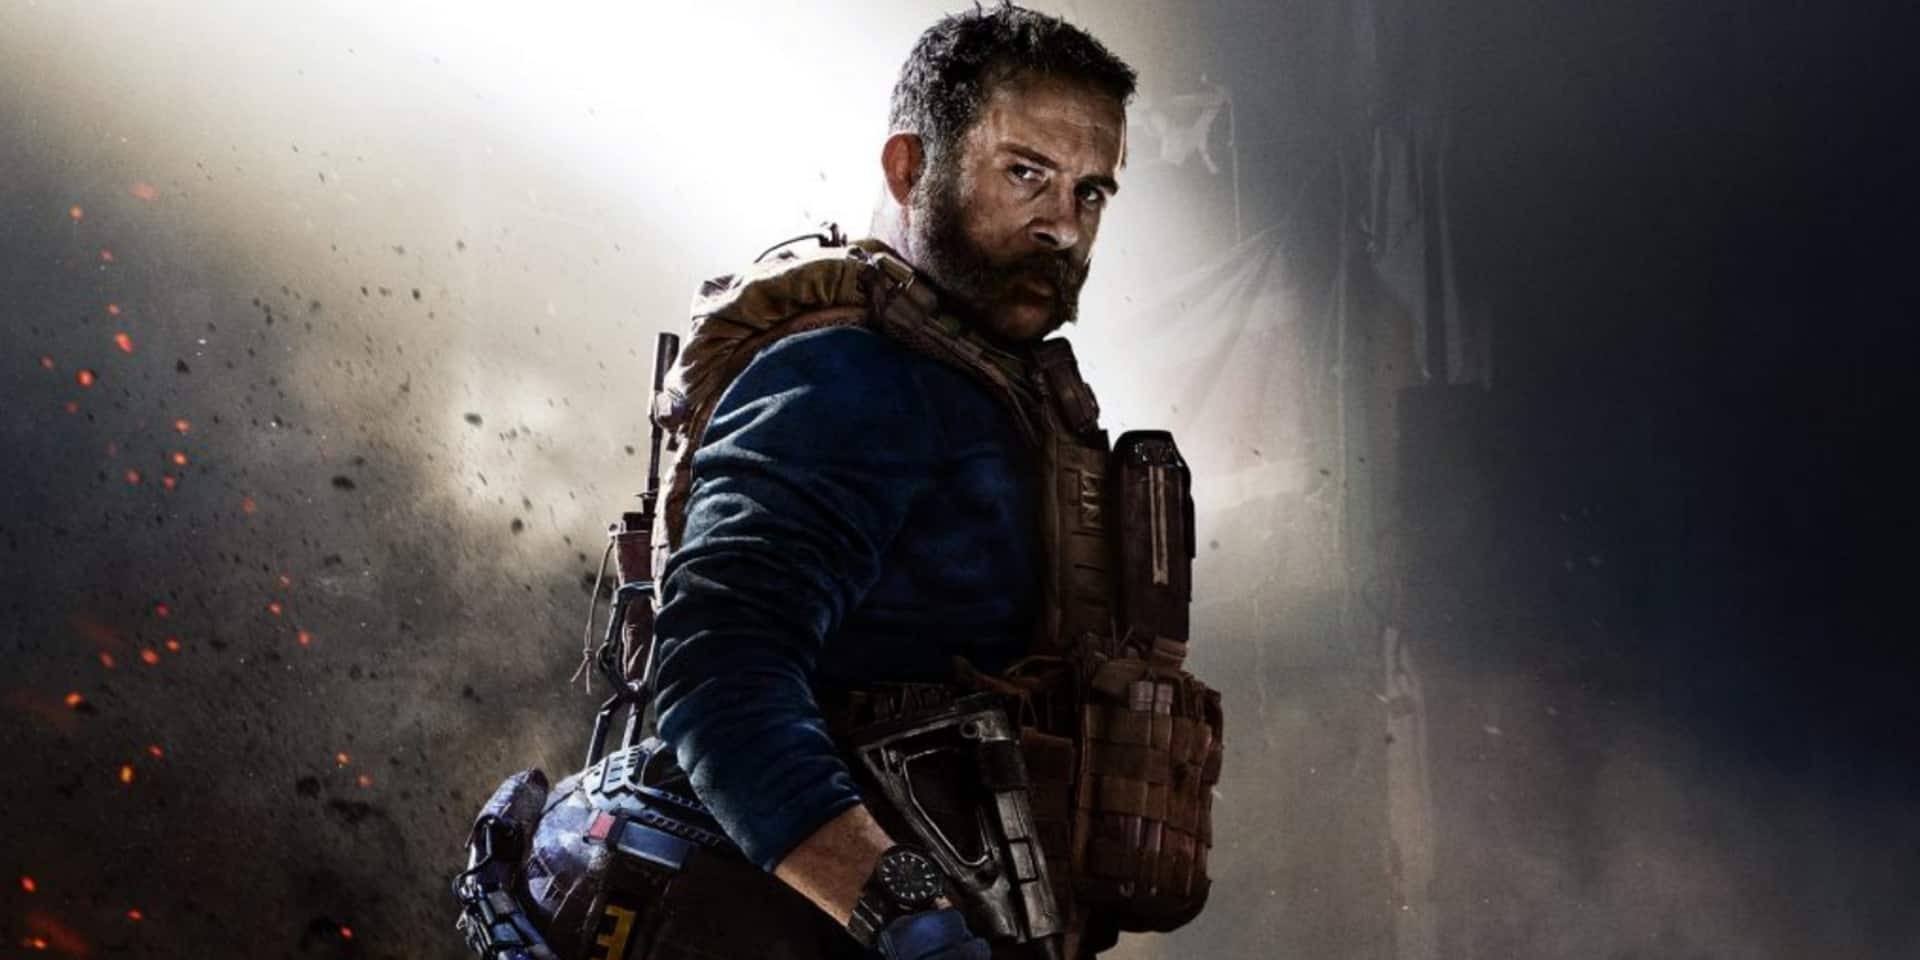 En Russie, le dernier opus du jeu Call of Duty fait scandale